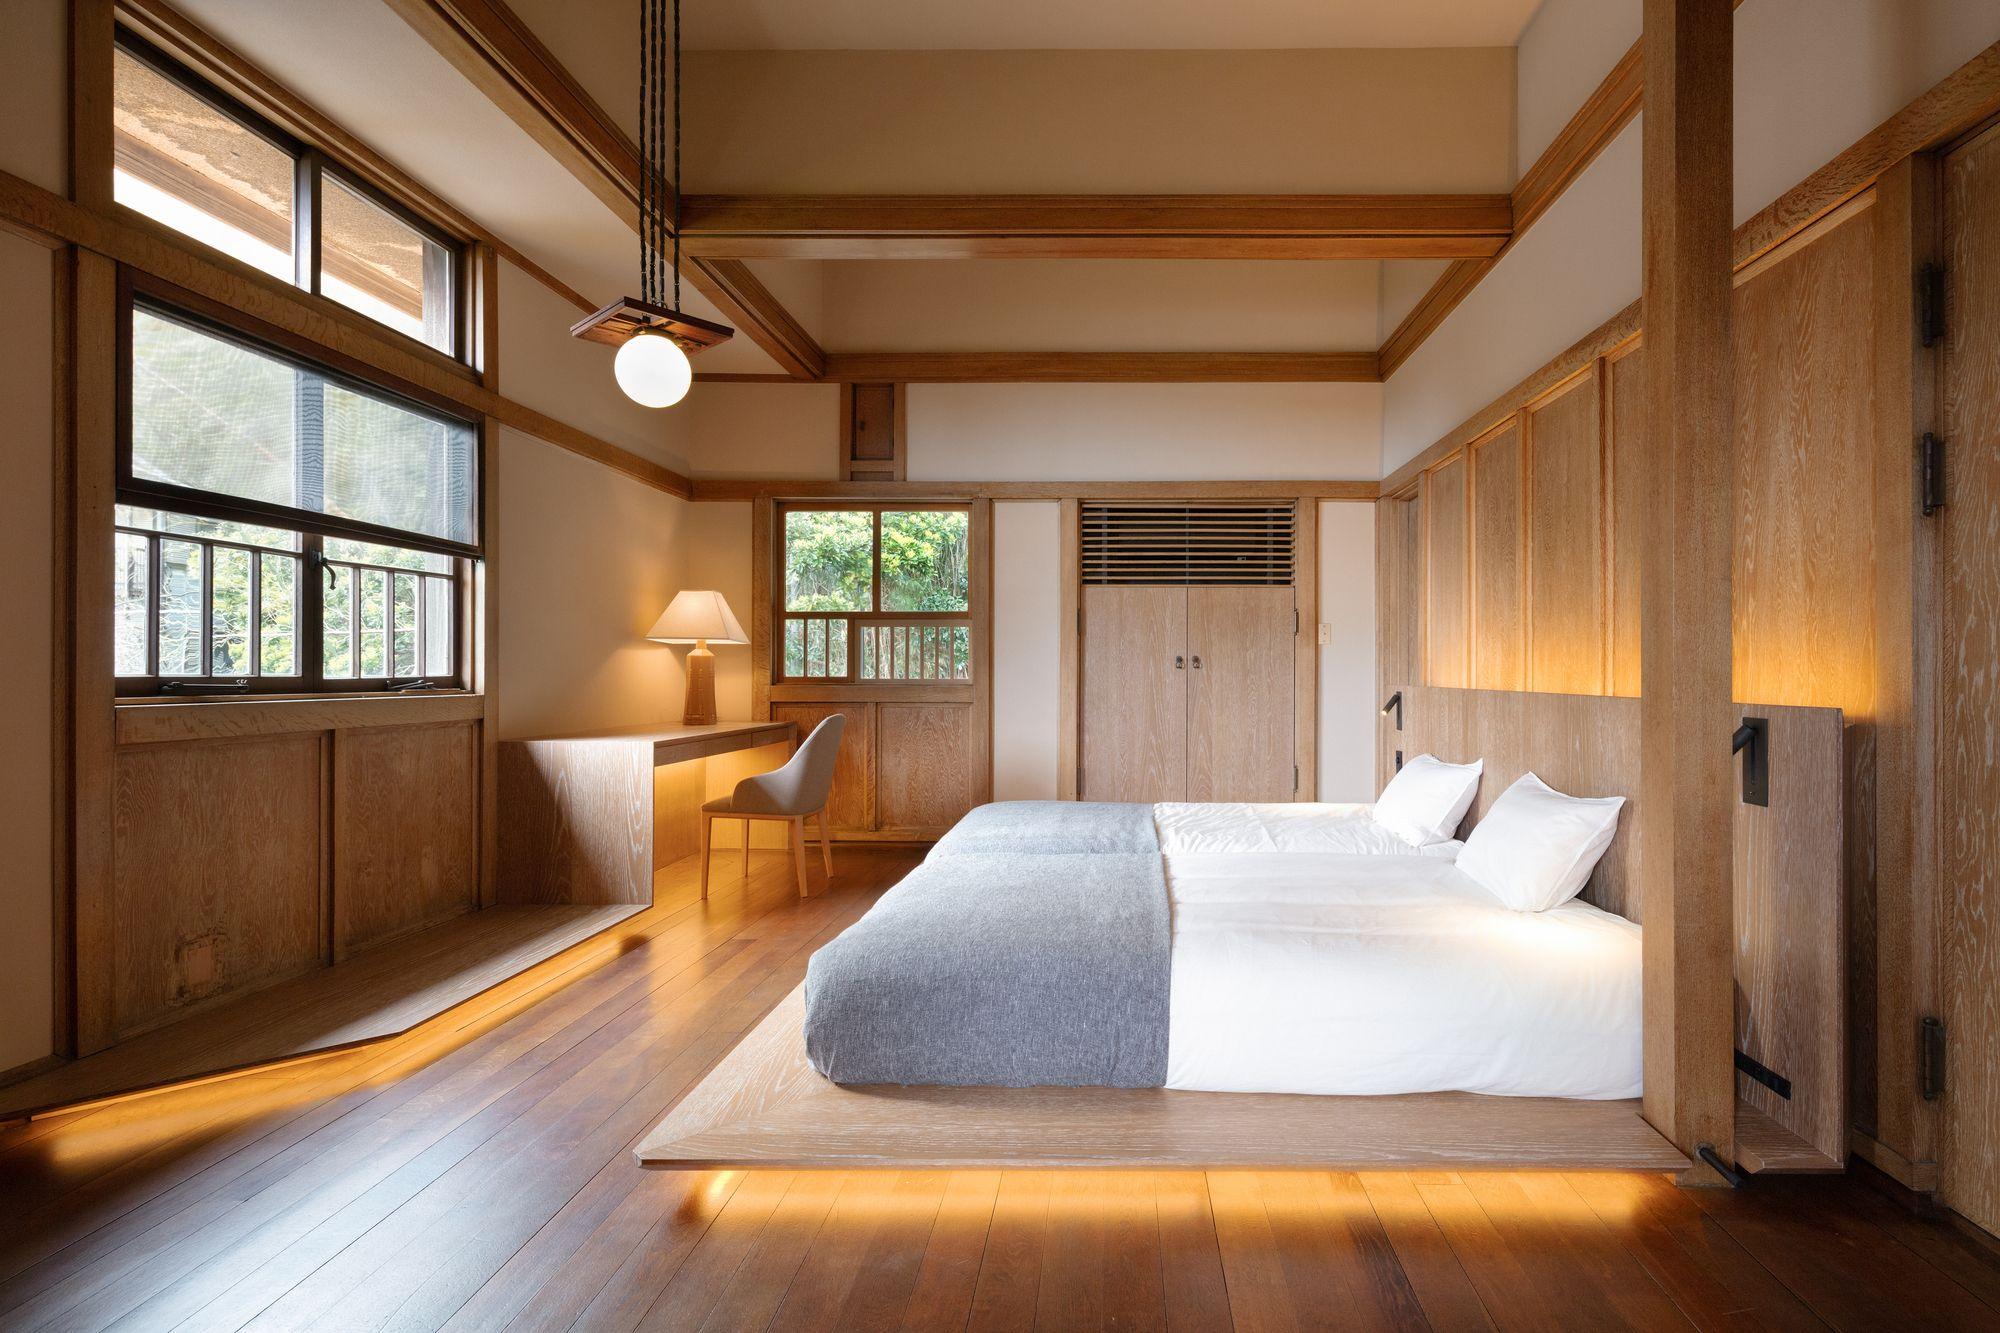 Renovation of Frank Lloyd Wright Prairie Style Villa into a Hotel | Kamiya Architects